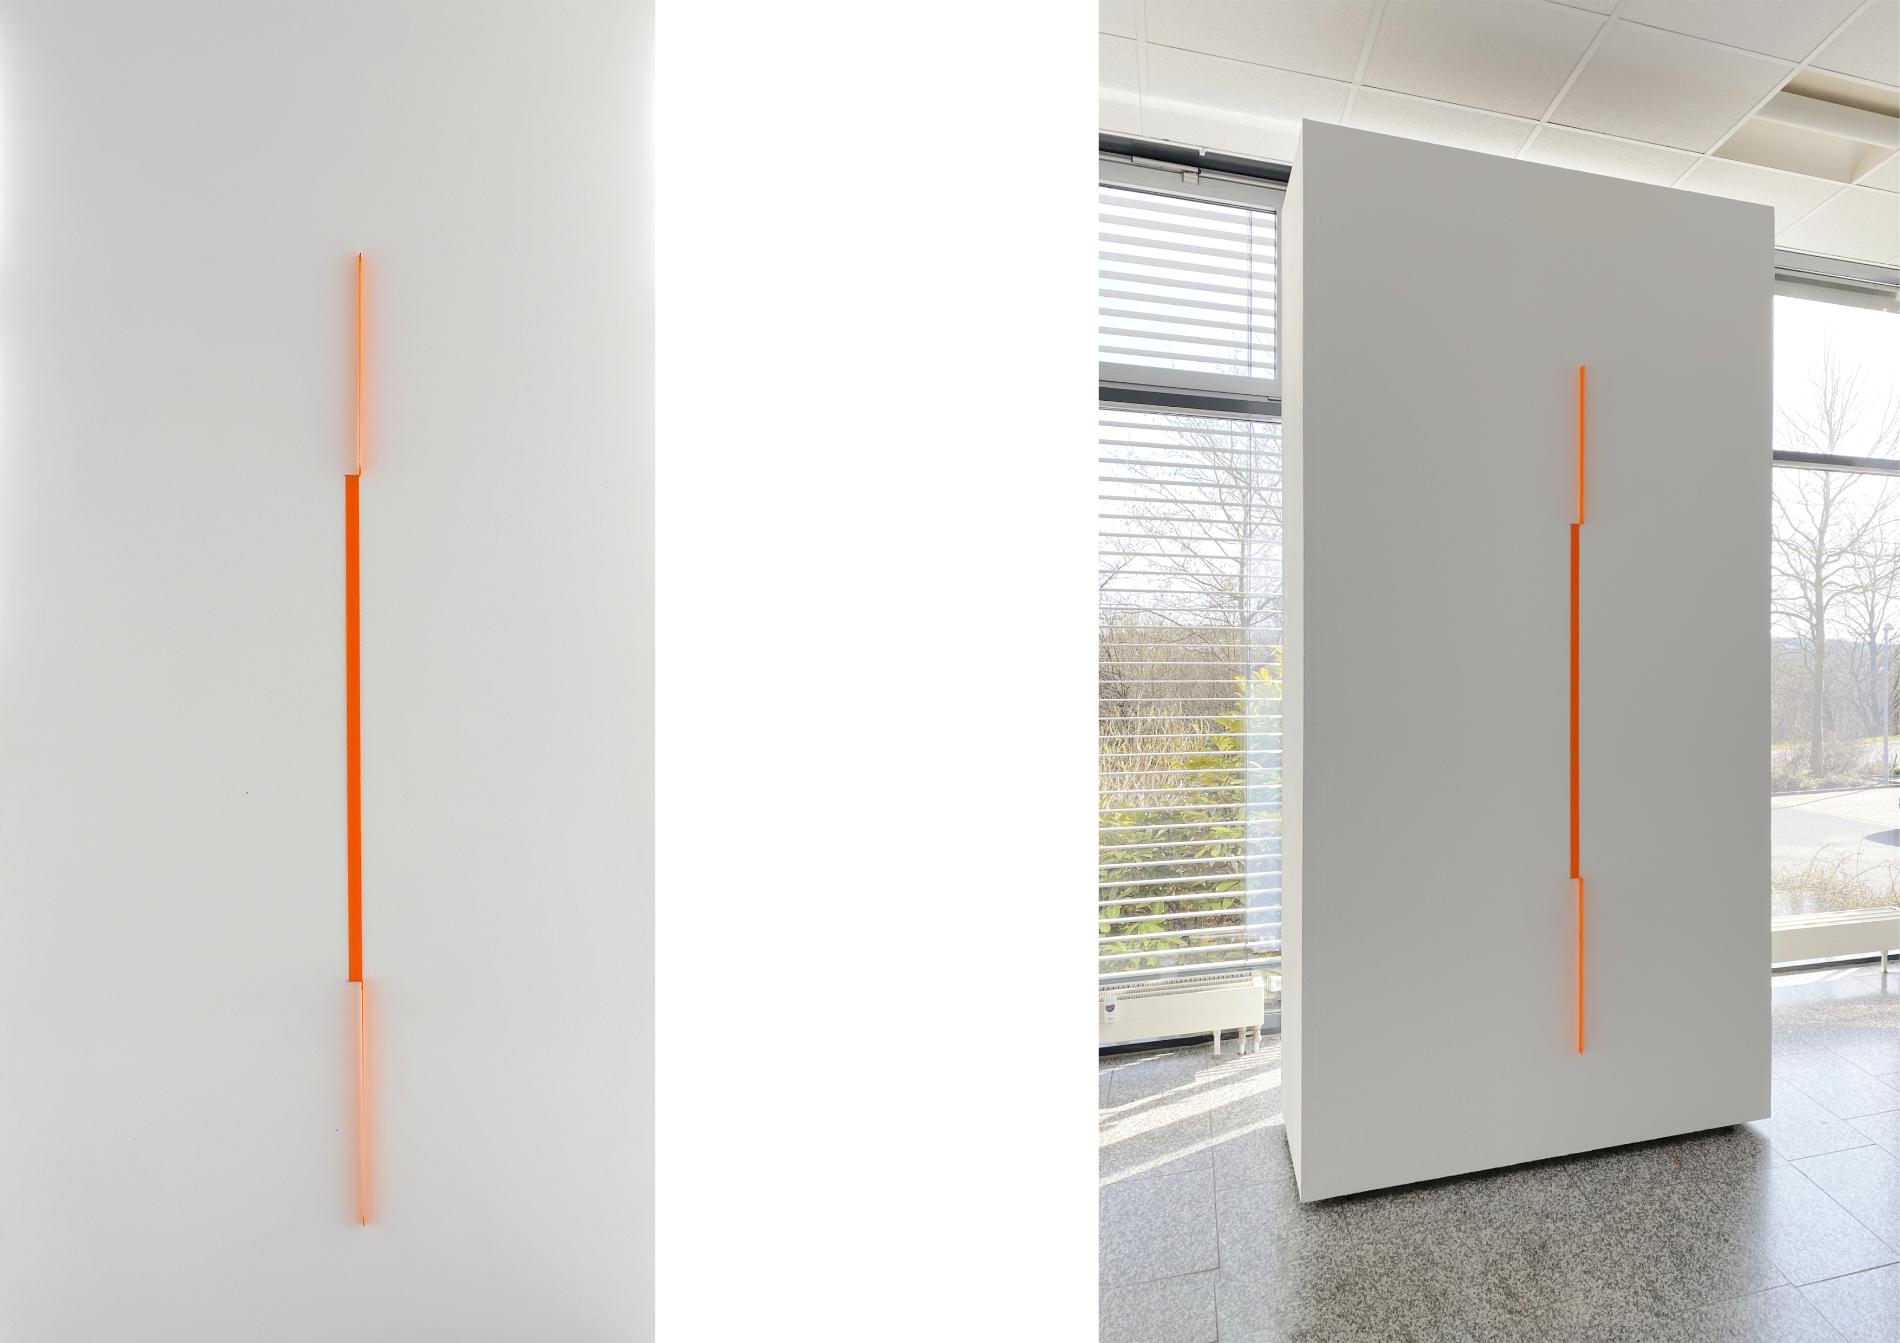 change_2021_tissue neonorange, steel pins, edition 3 + 2e.a._196 x 3 x 3 cm